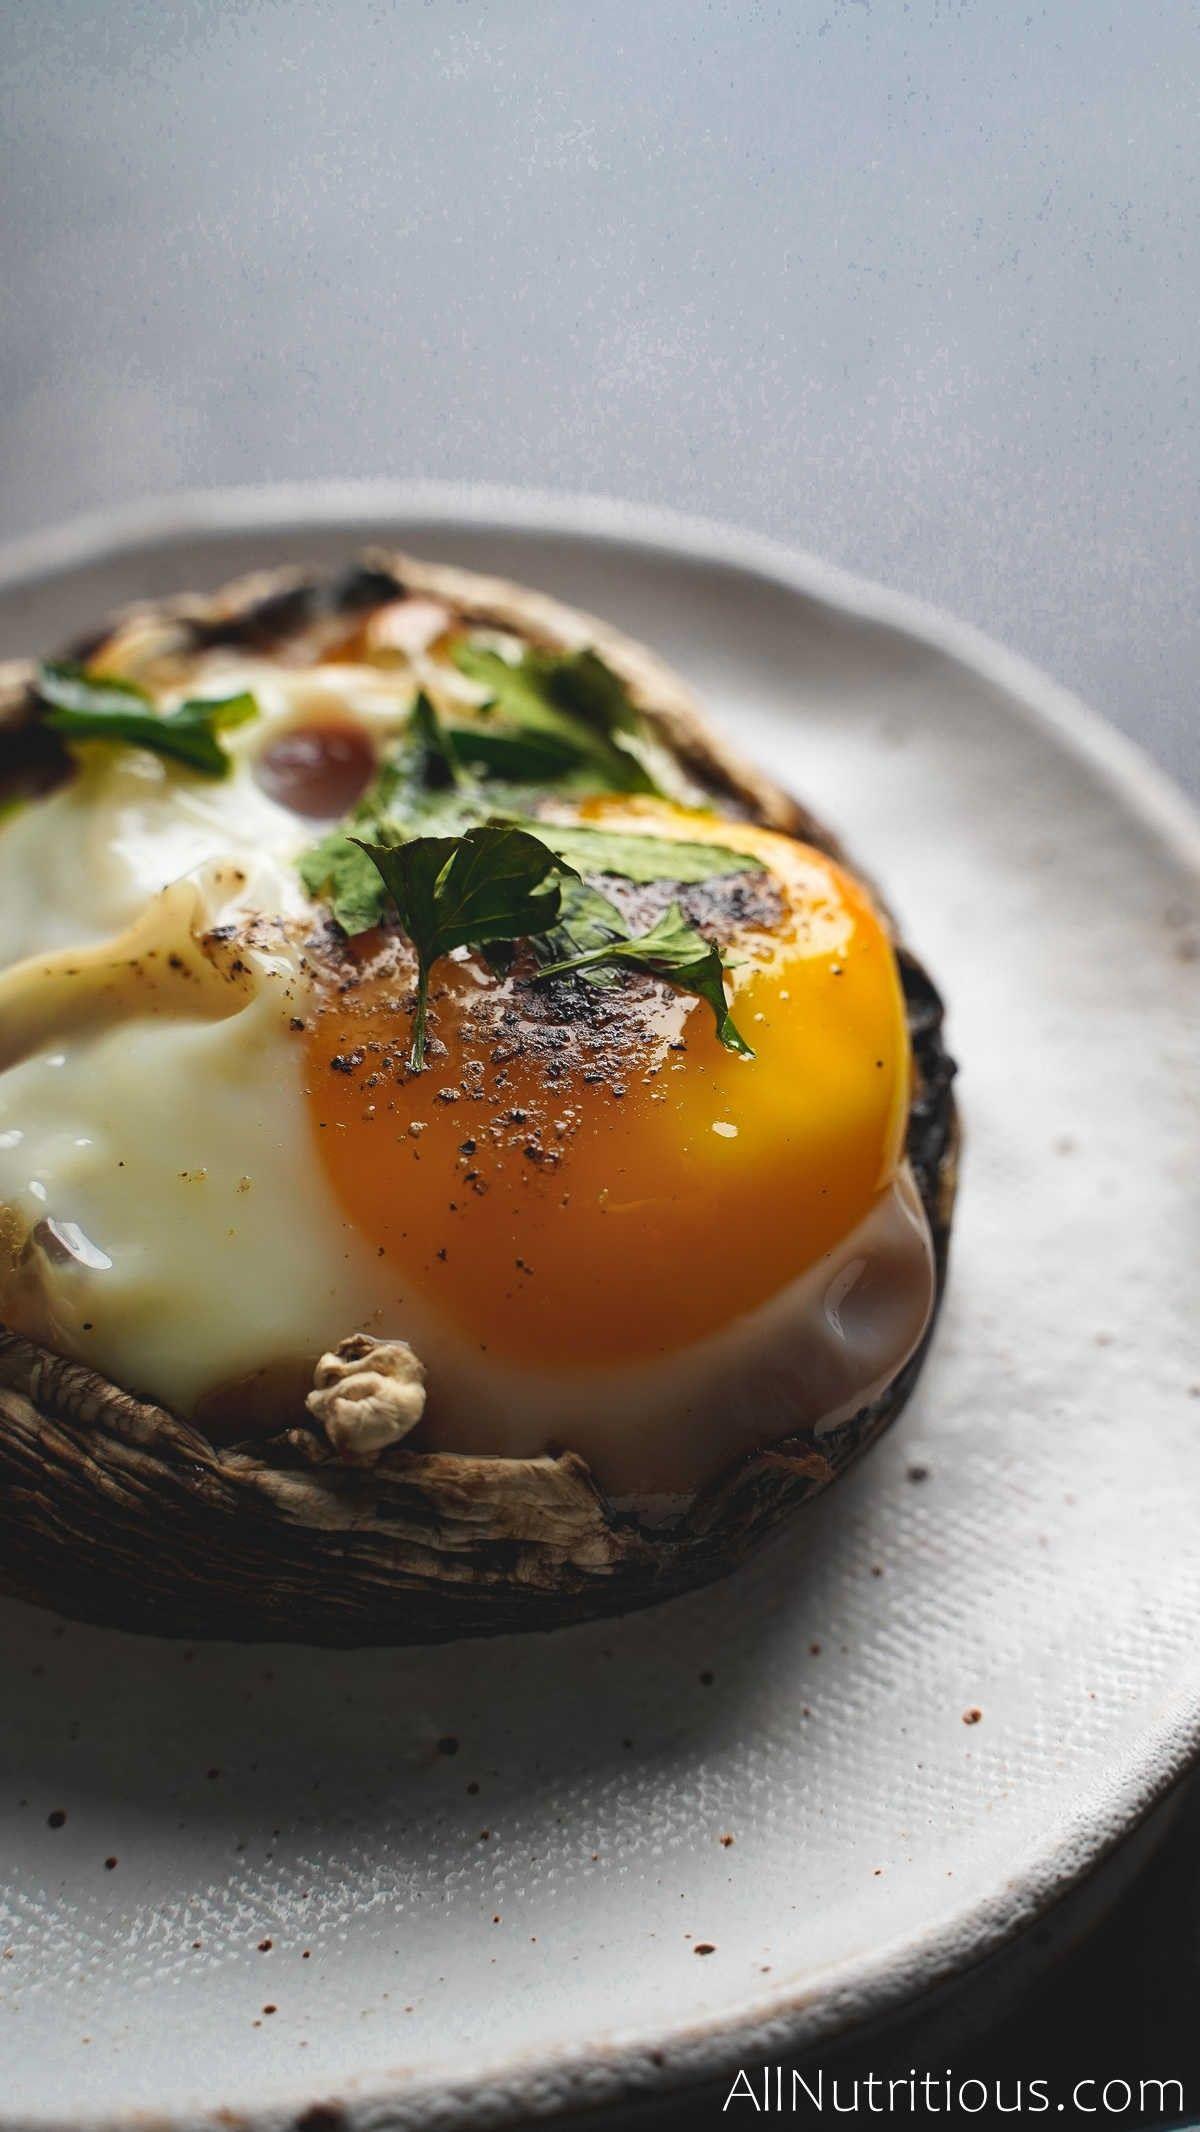 egg cooked in mushroom